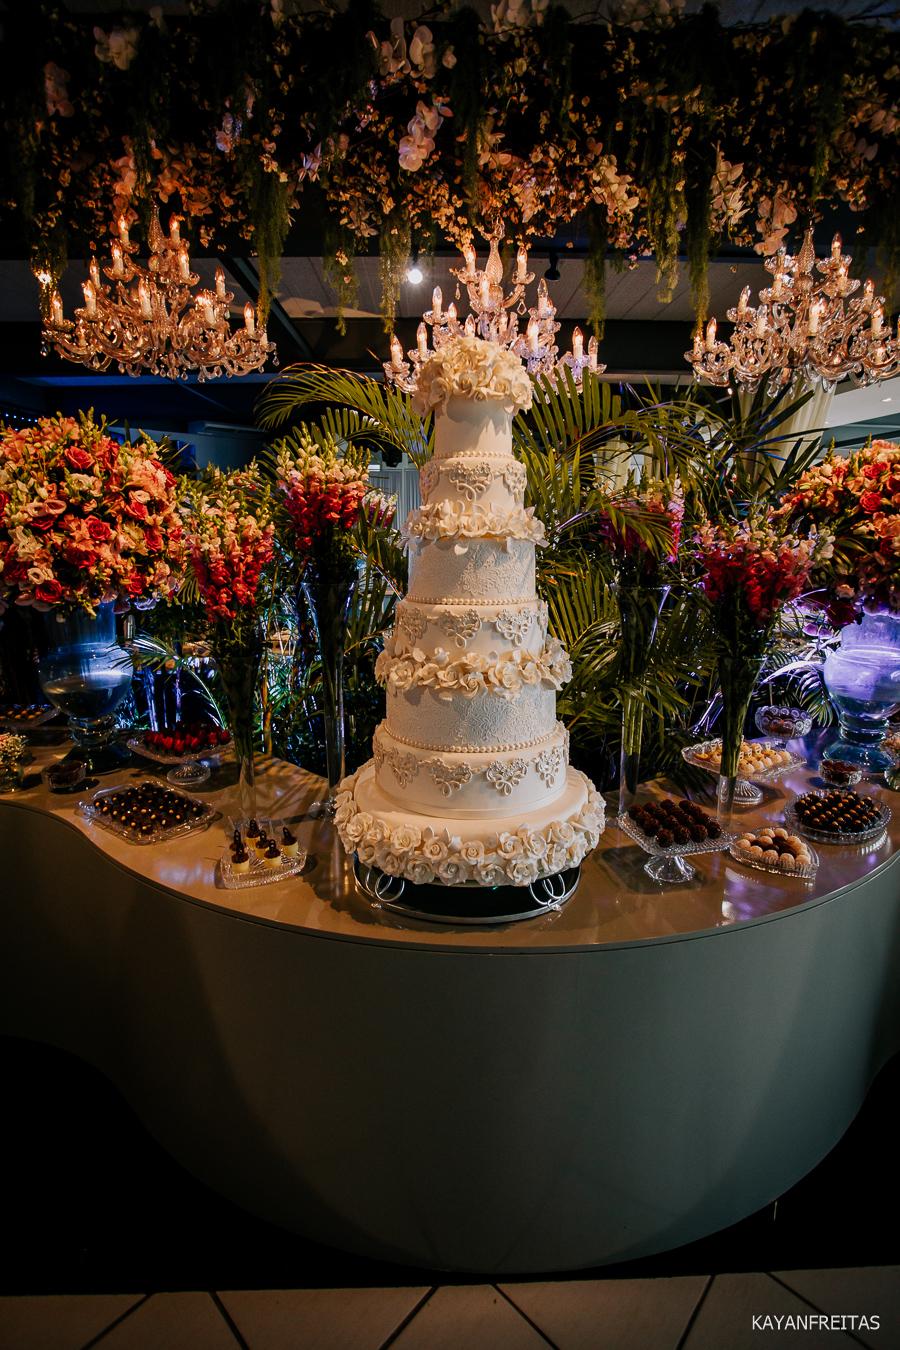 casamento-mariadomar-floripa-0025 Casamento Jéssica e Felipe - Maria do Mar Hotel